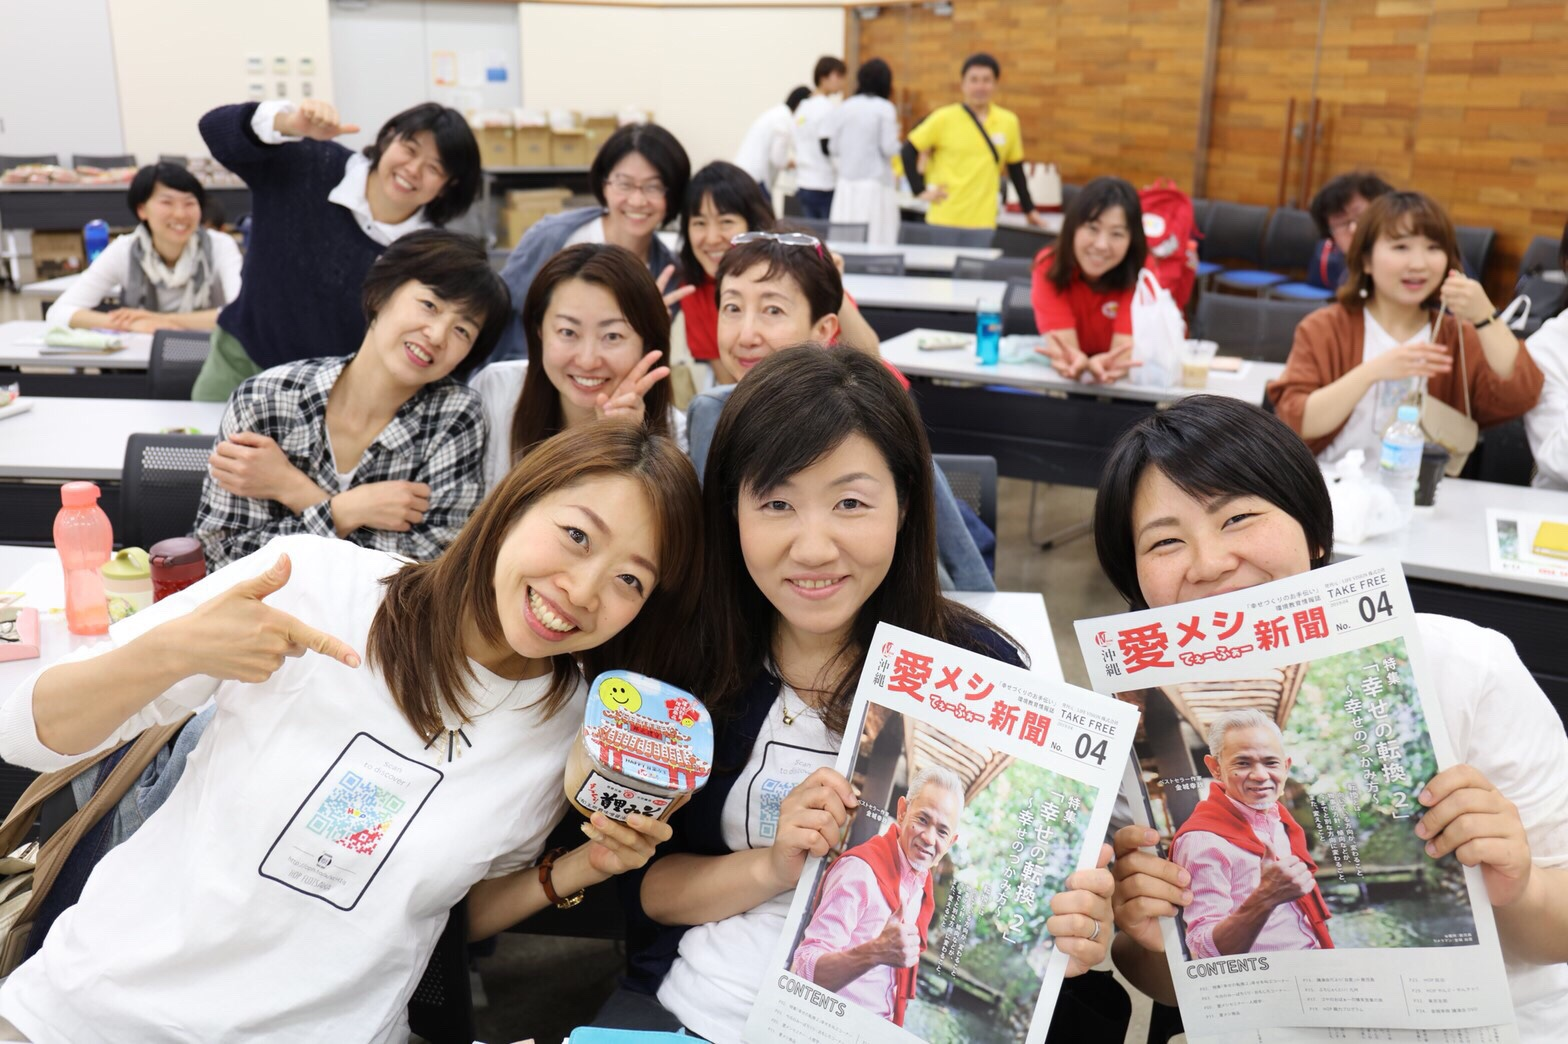 2019/4/23 1010HAPPY 藤沢クラス Eグループ